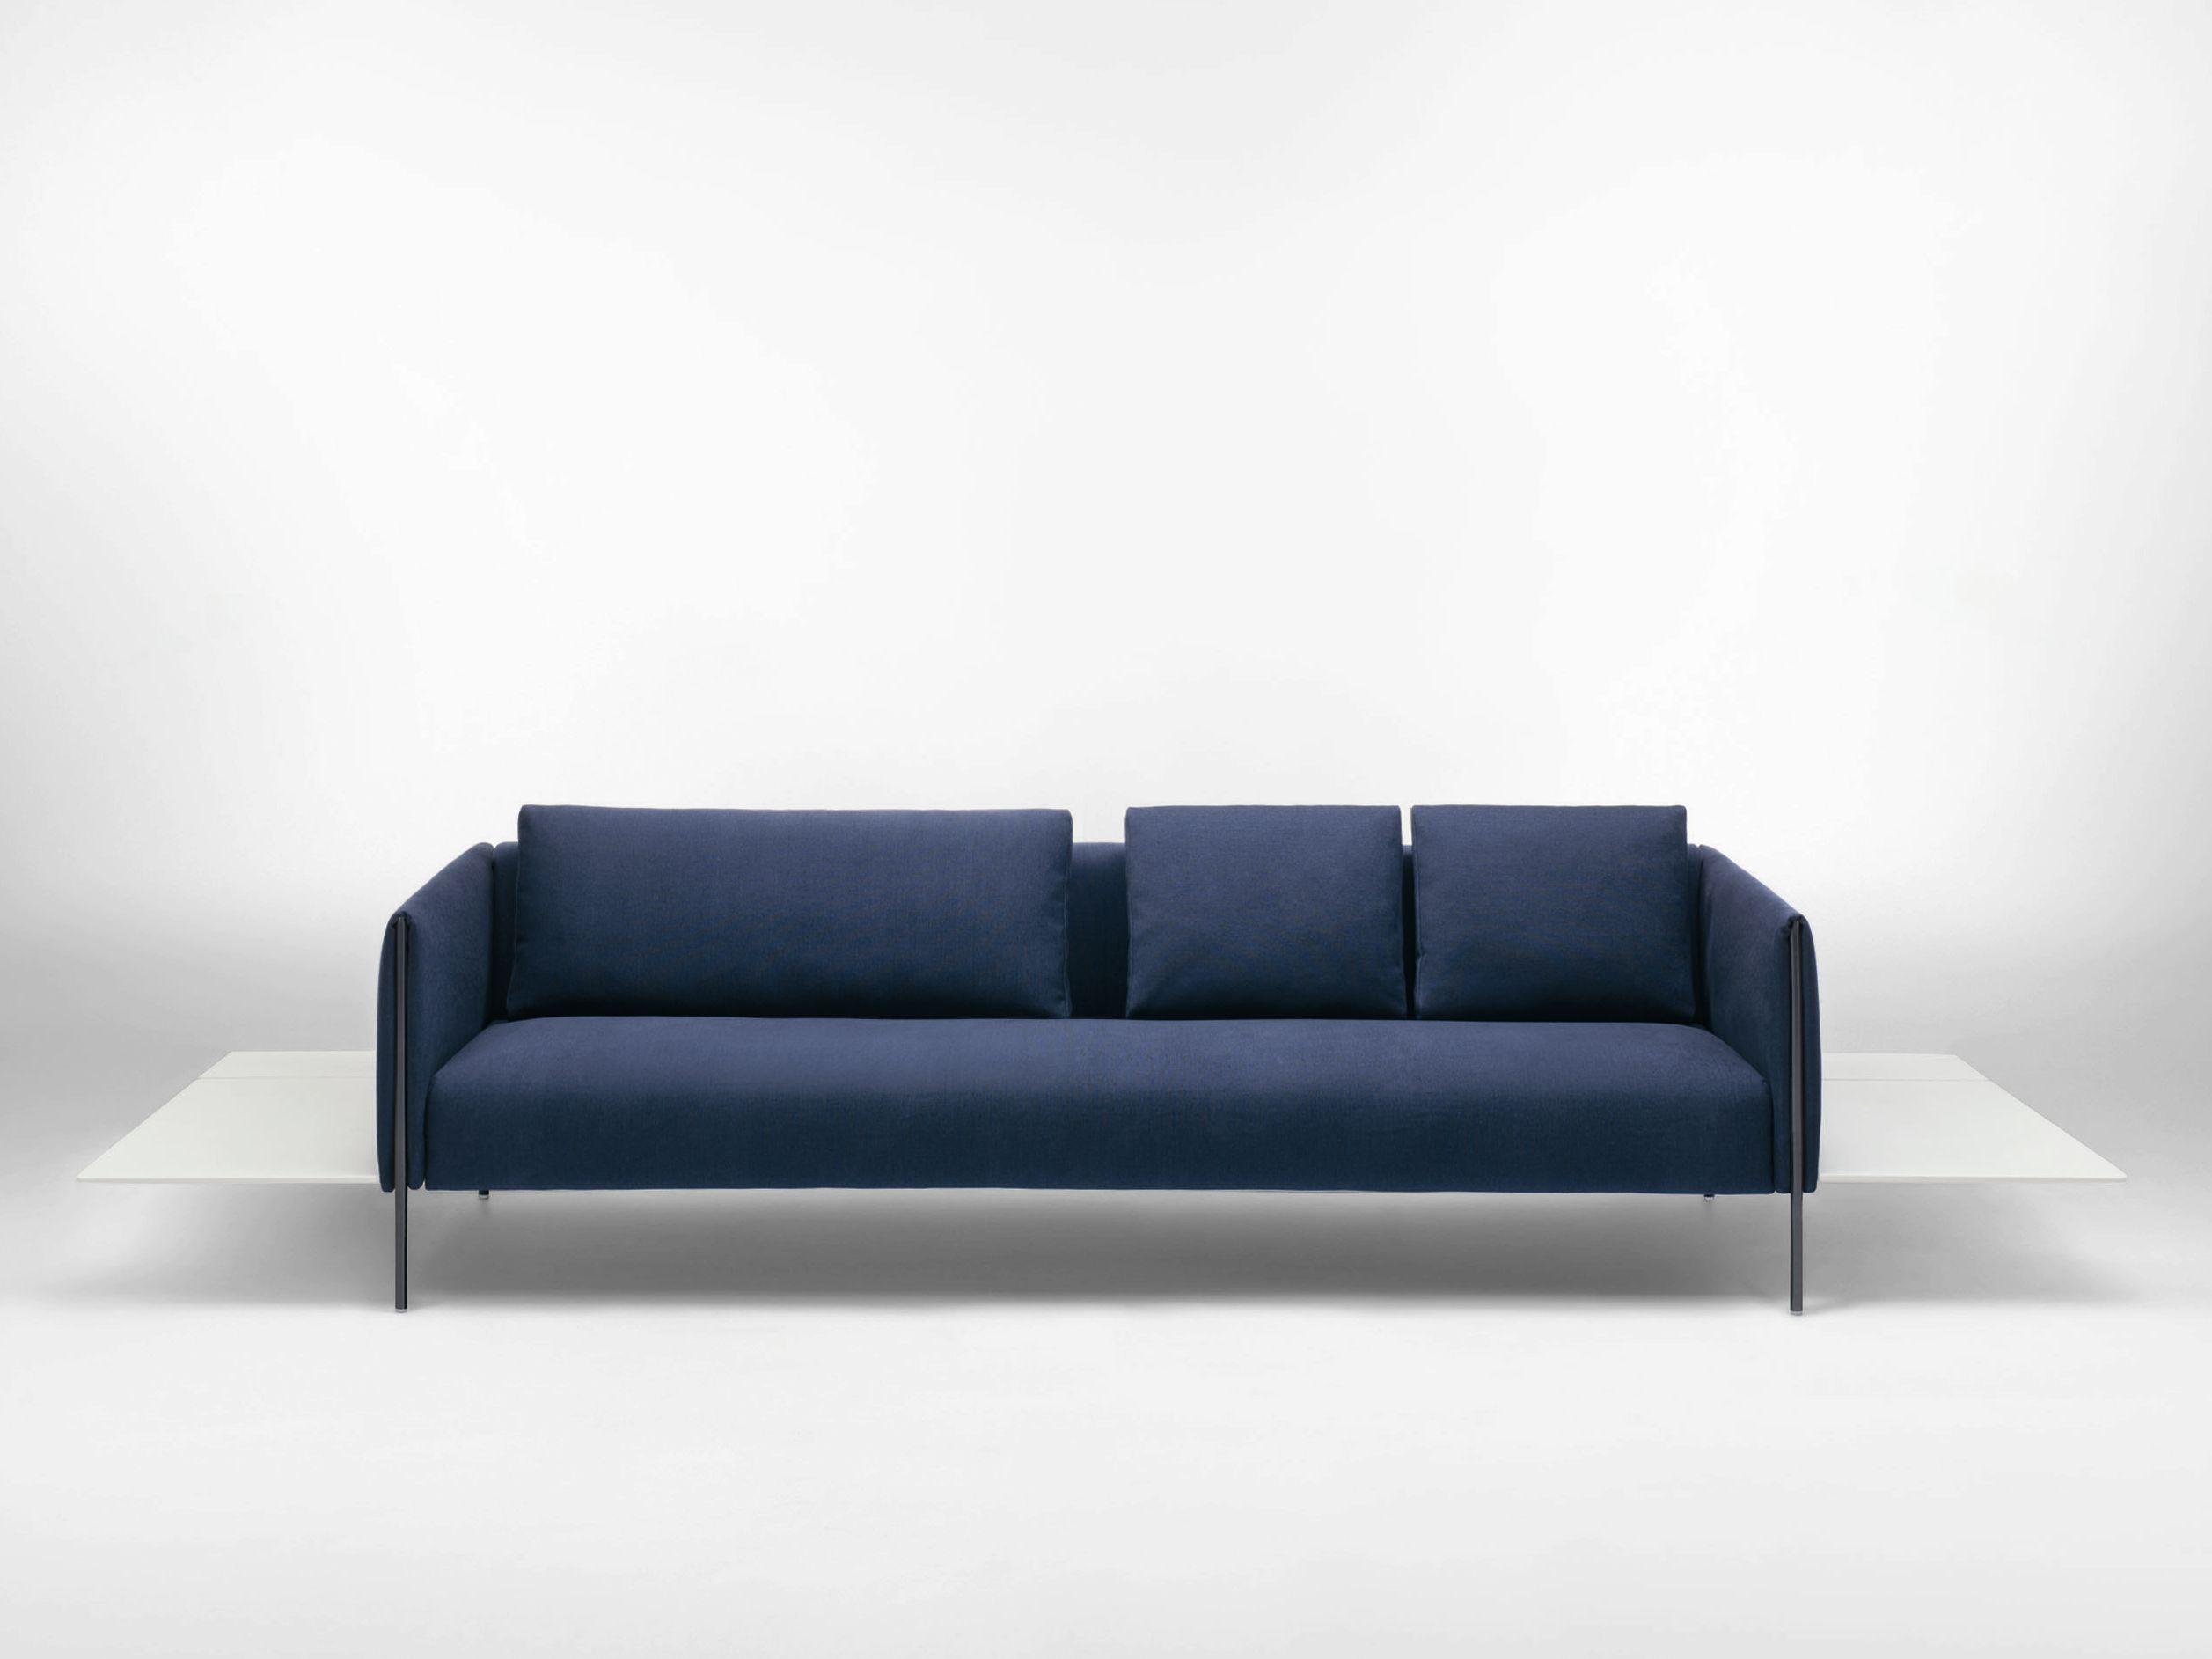 3 seater sofa PILLAR Paola Lenti Minimalist Design